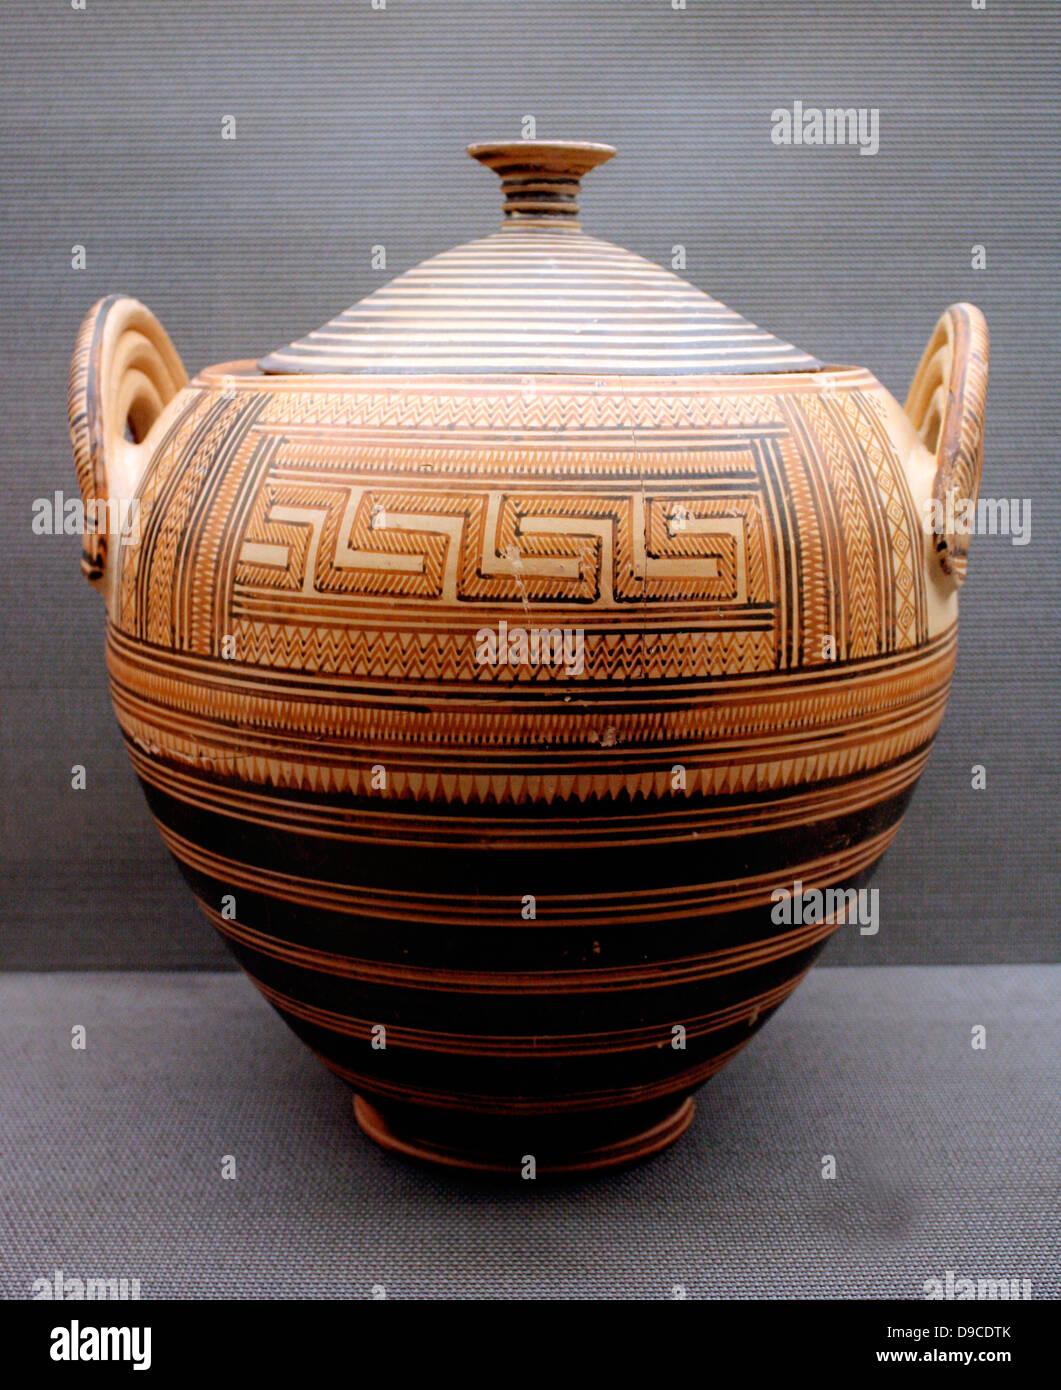 Cinerary Pyxis or jar with lid. Greek burial jar circa 8th Century BC Athens, Greece. - Stock Image